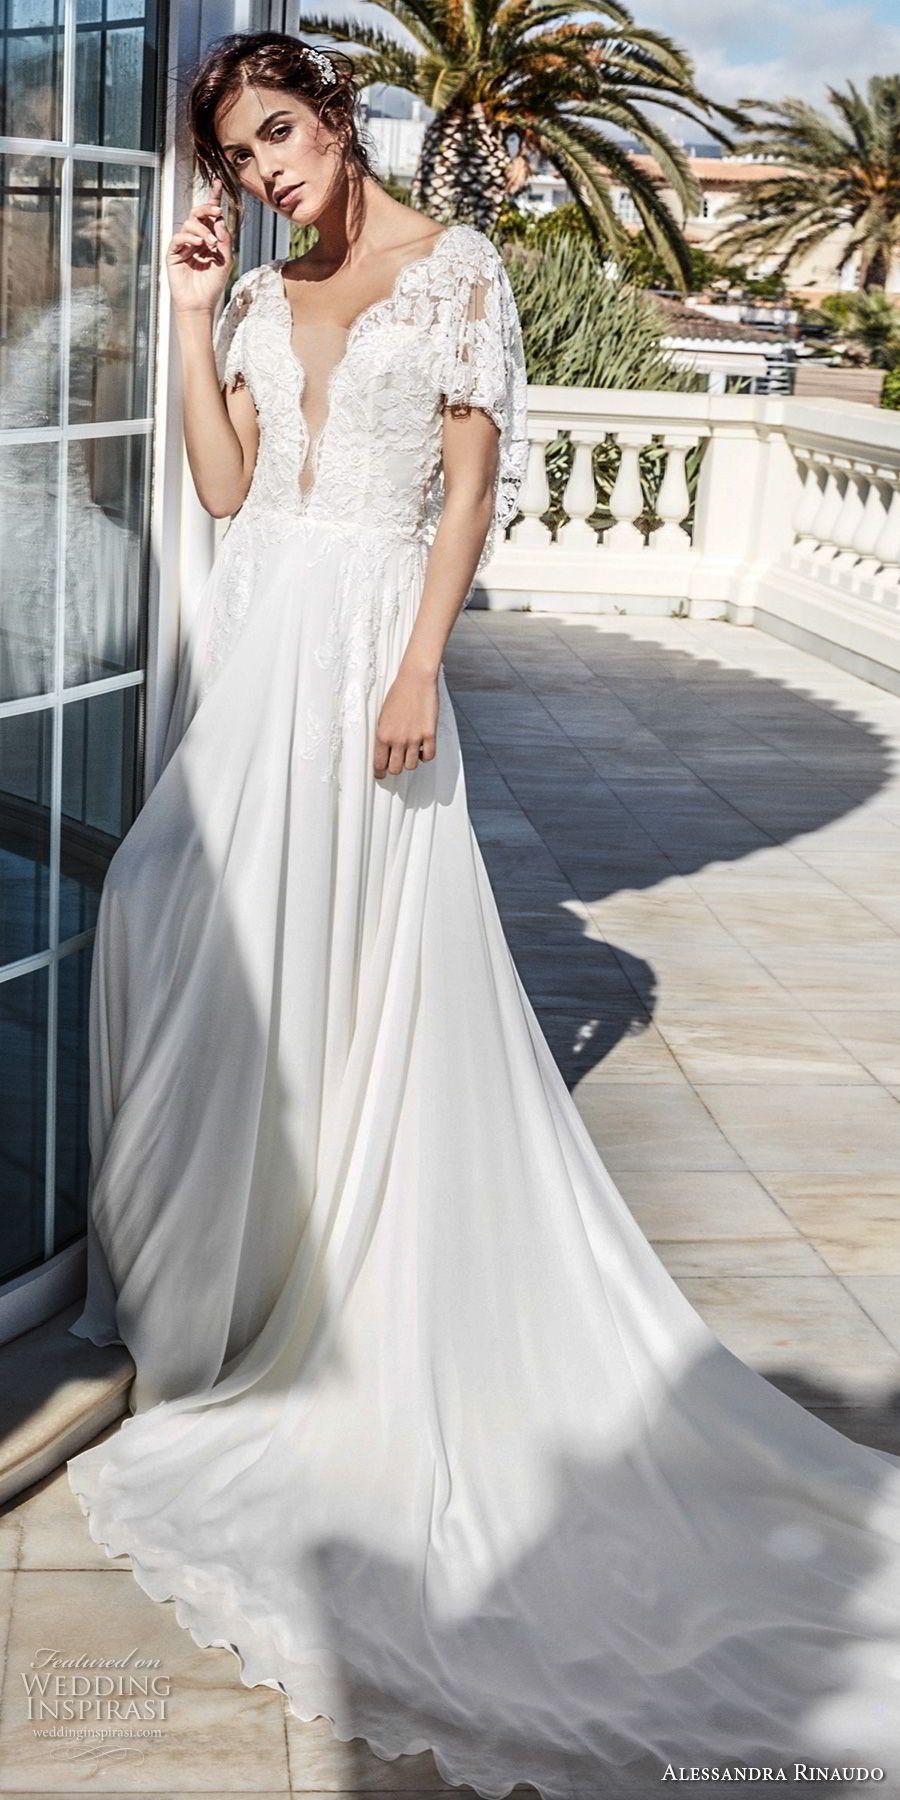 Alessandra rinaudo wedding dresses chapel train wedding